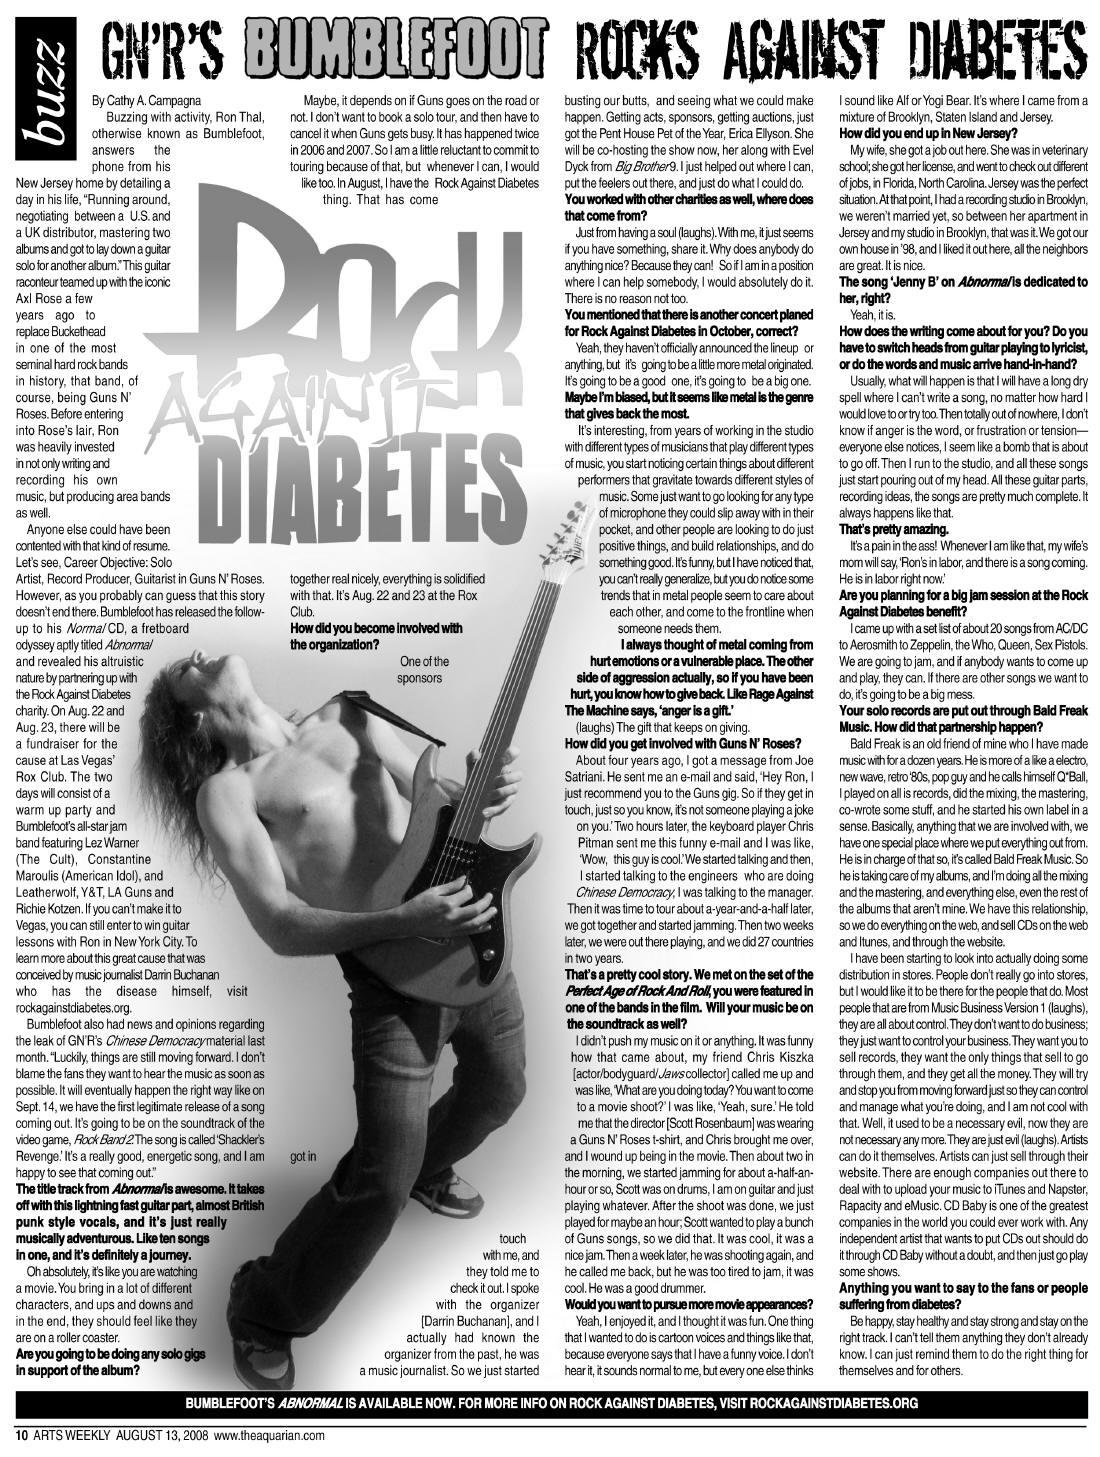 2008.08.13 - Aquarian Magazine - GN'R's Bumblefoot Rocks Against Diabetes 20080810